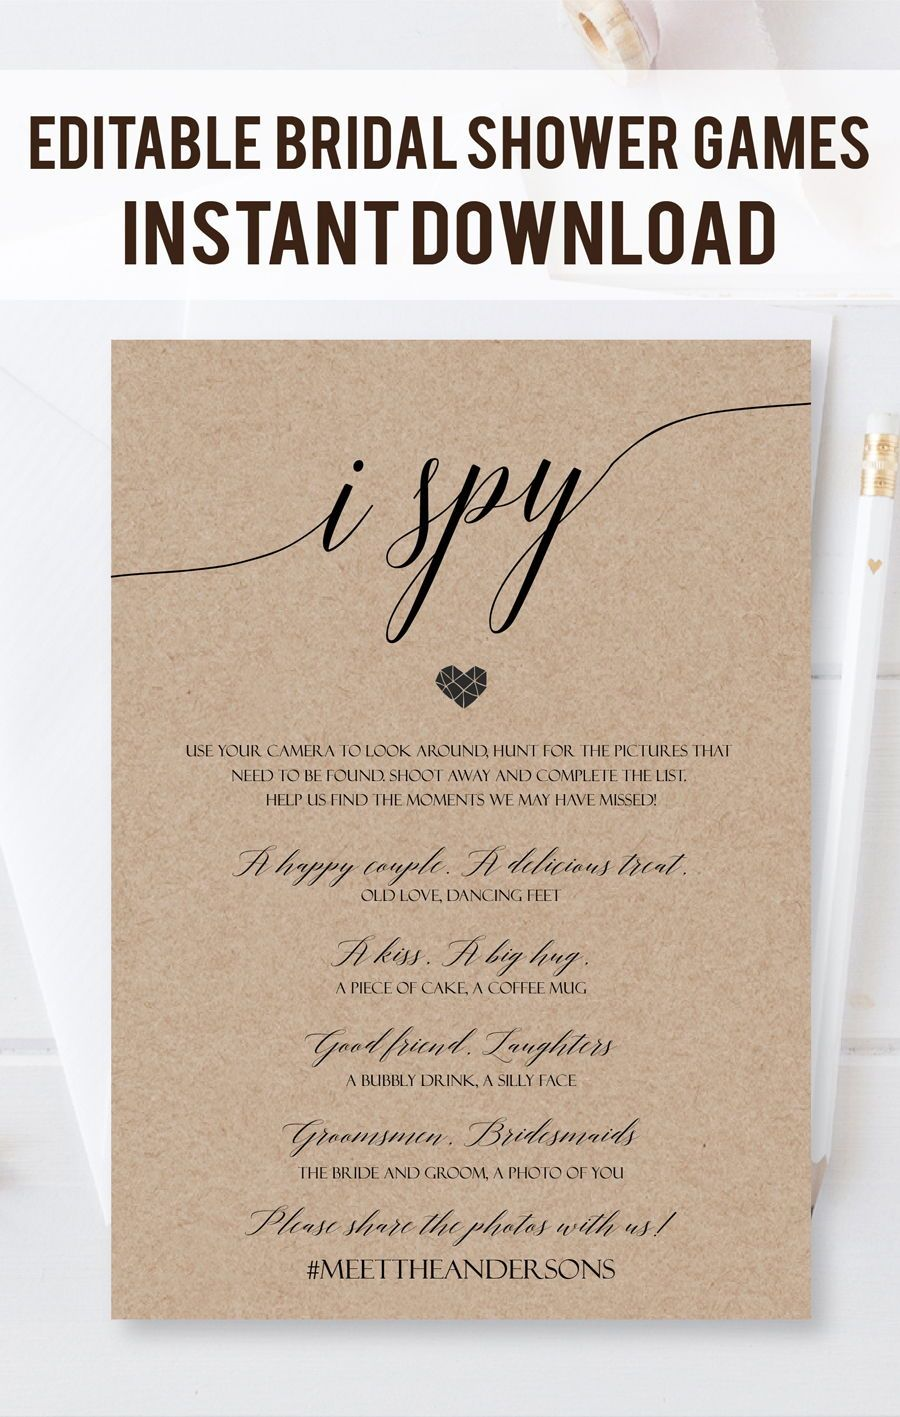 100 custom printable wedding i spy game cards i spy wedding game i spy rustic wedding game unique and fun wedding game or bridal game for your maxwellsz